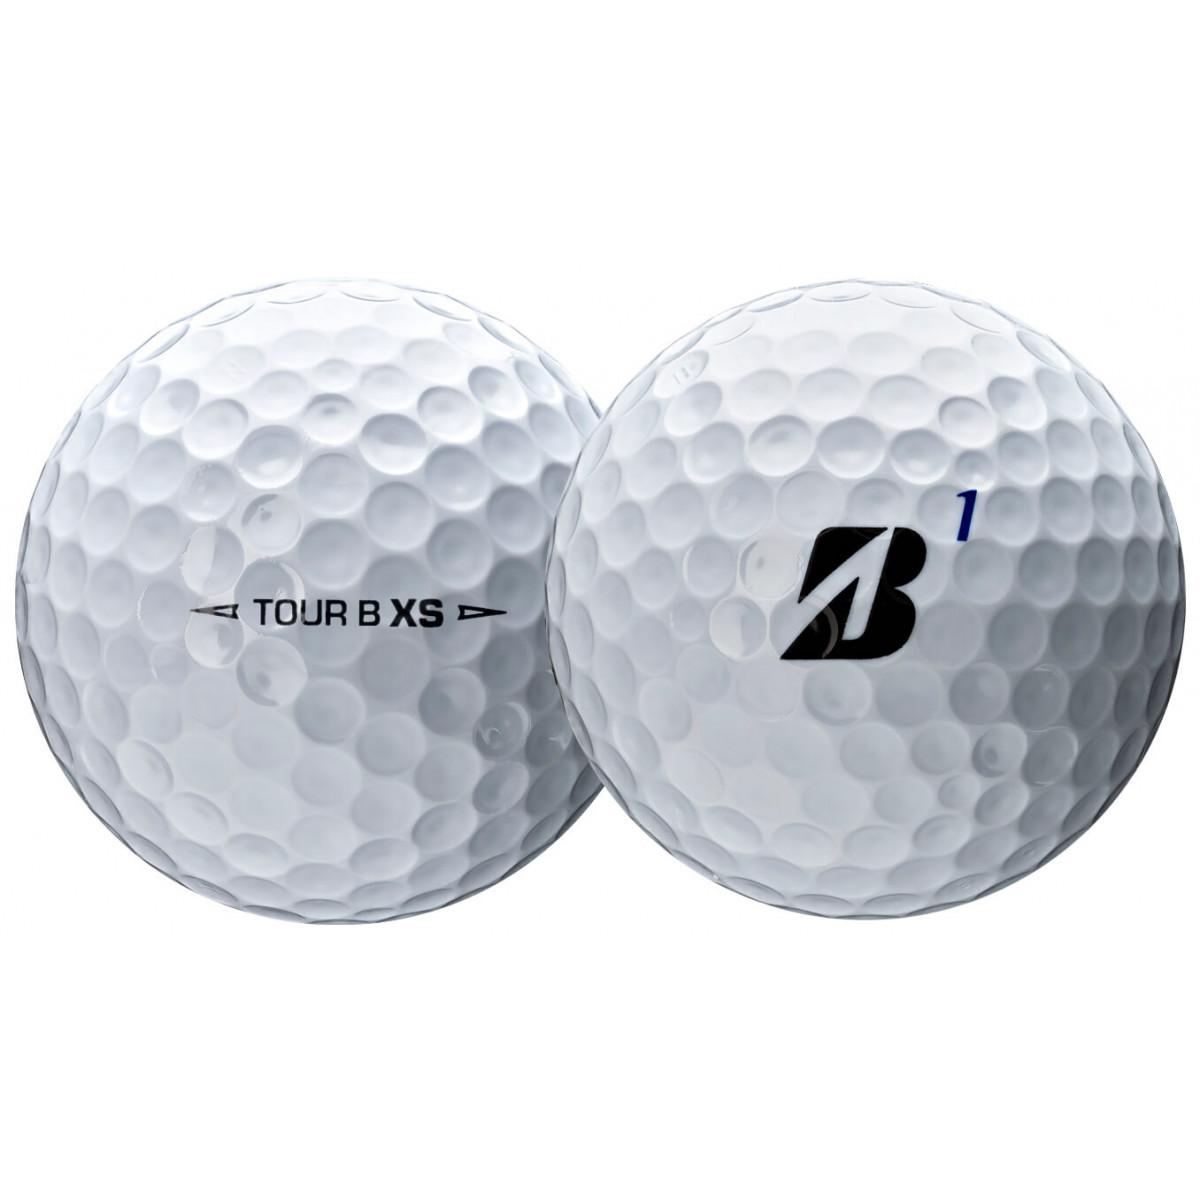 11++ Cheapest urethane golf ball 2018 information